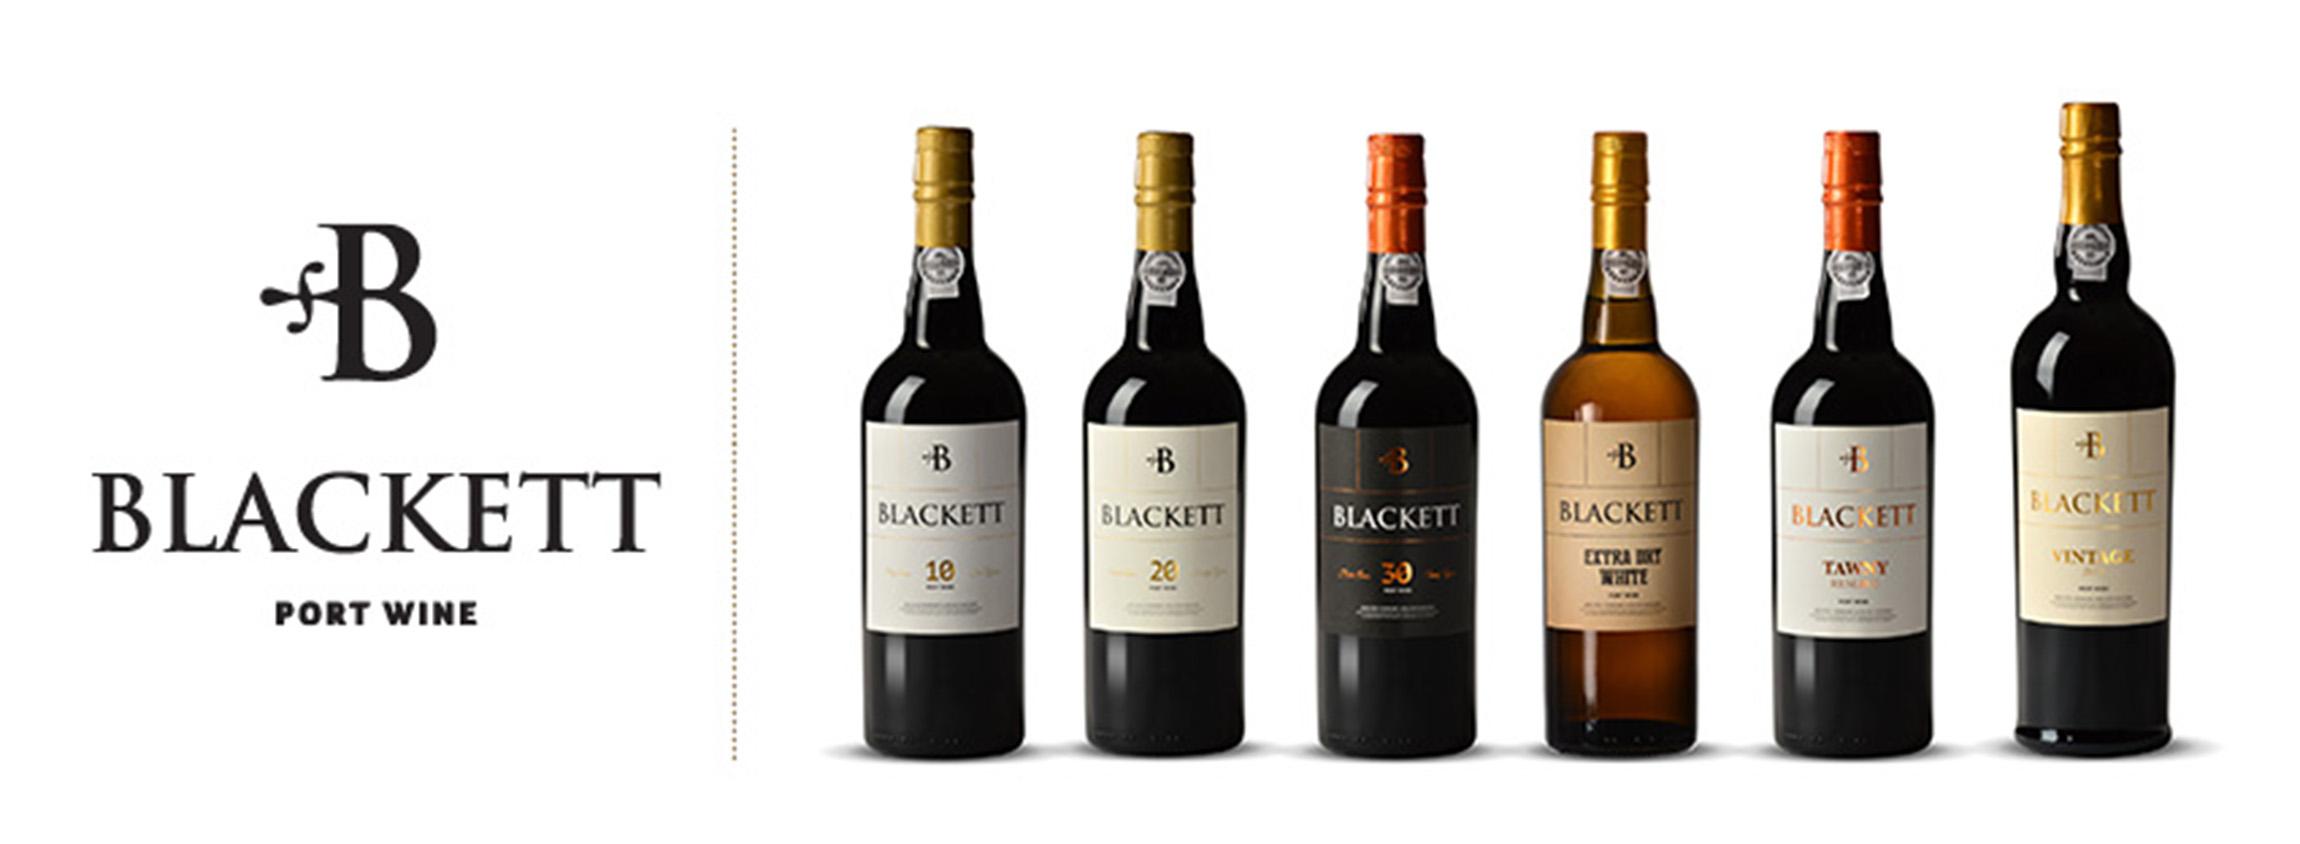 WineEnthusiast distingue os Portos Blackett